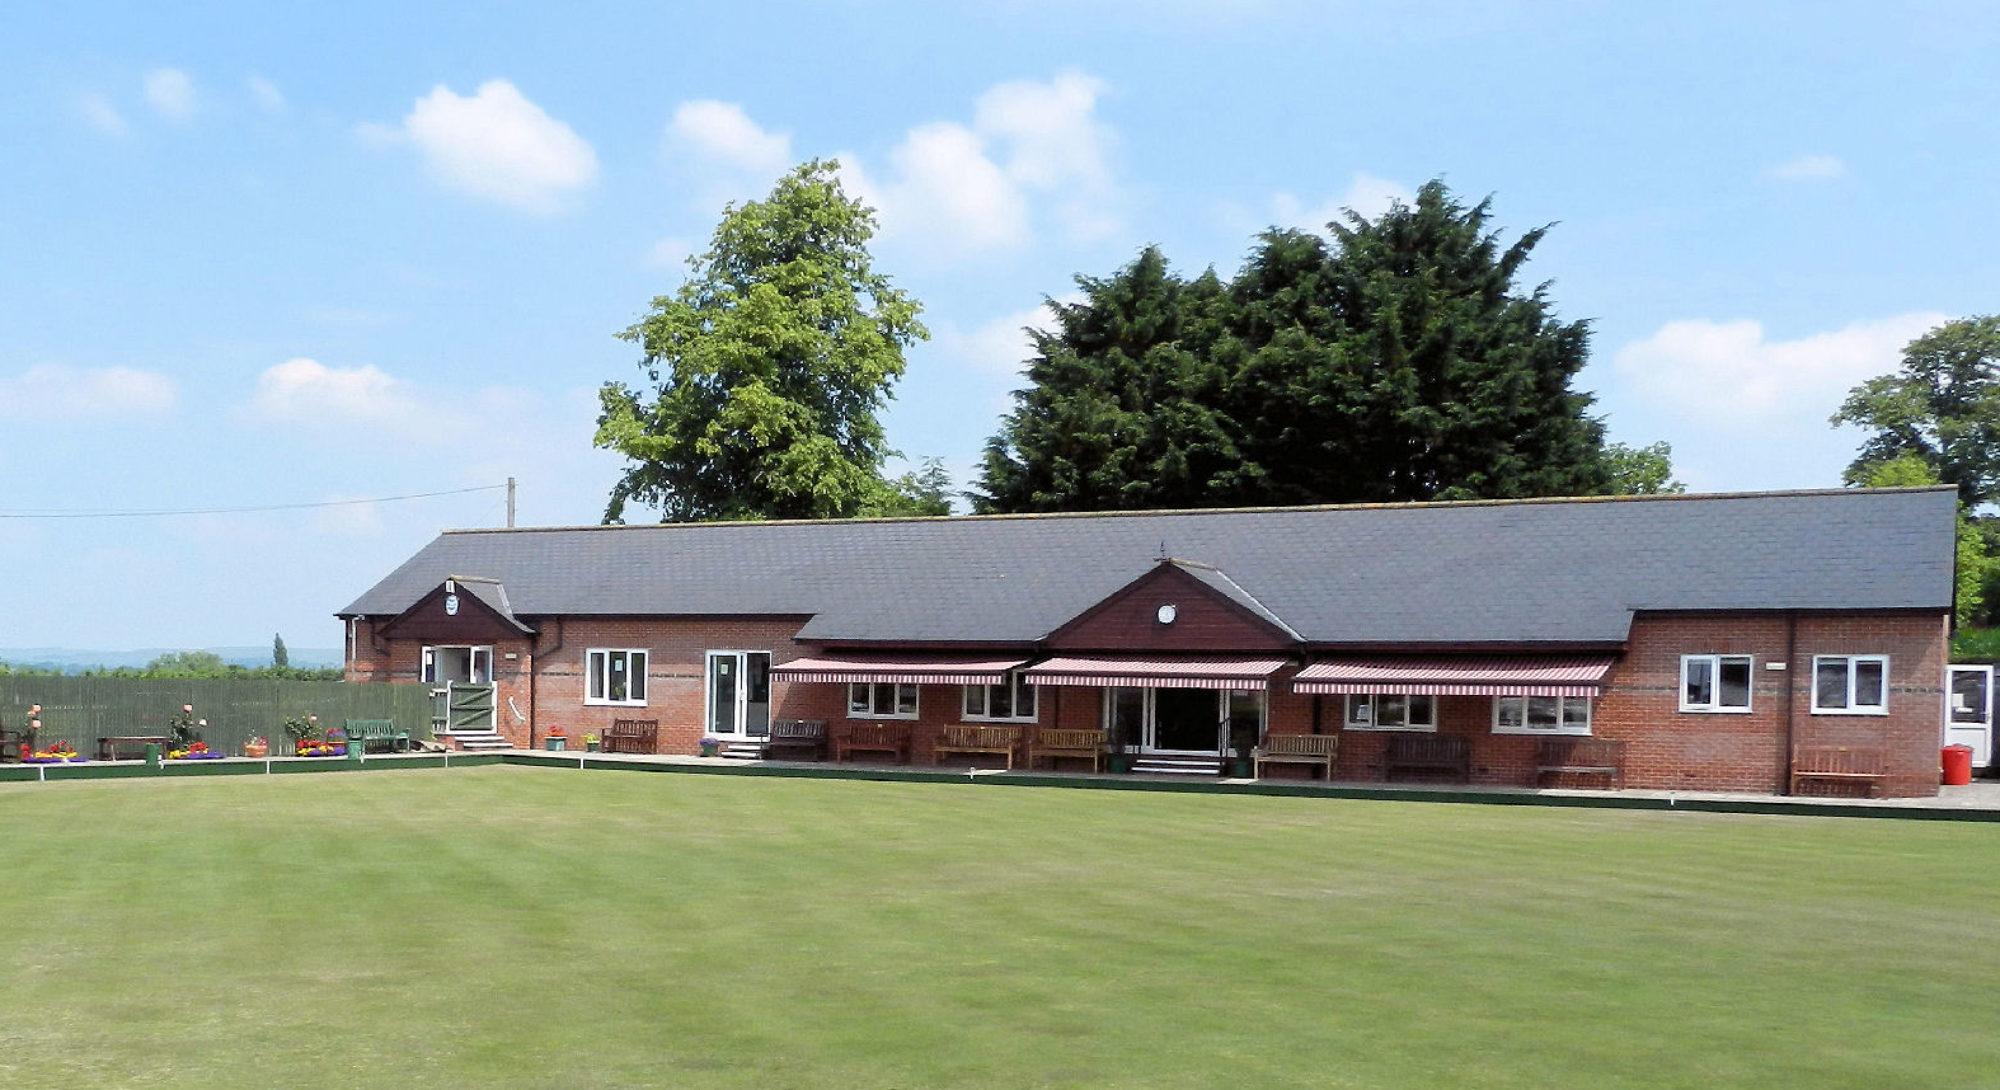 Gillingham Bowls Club